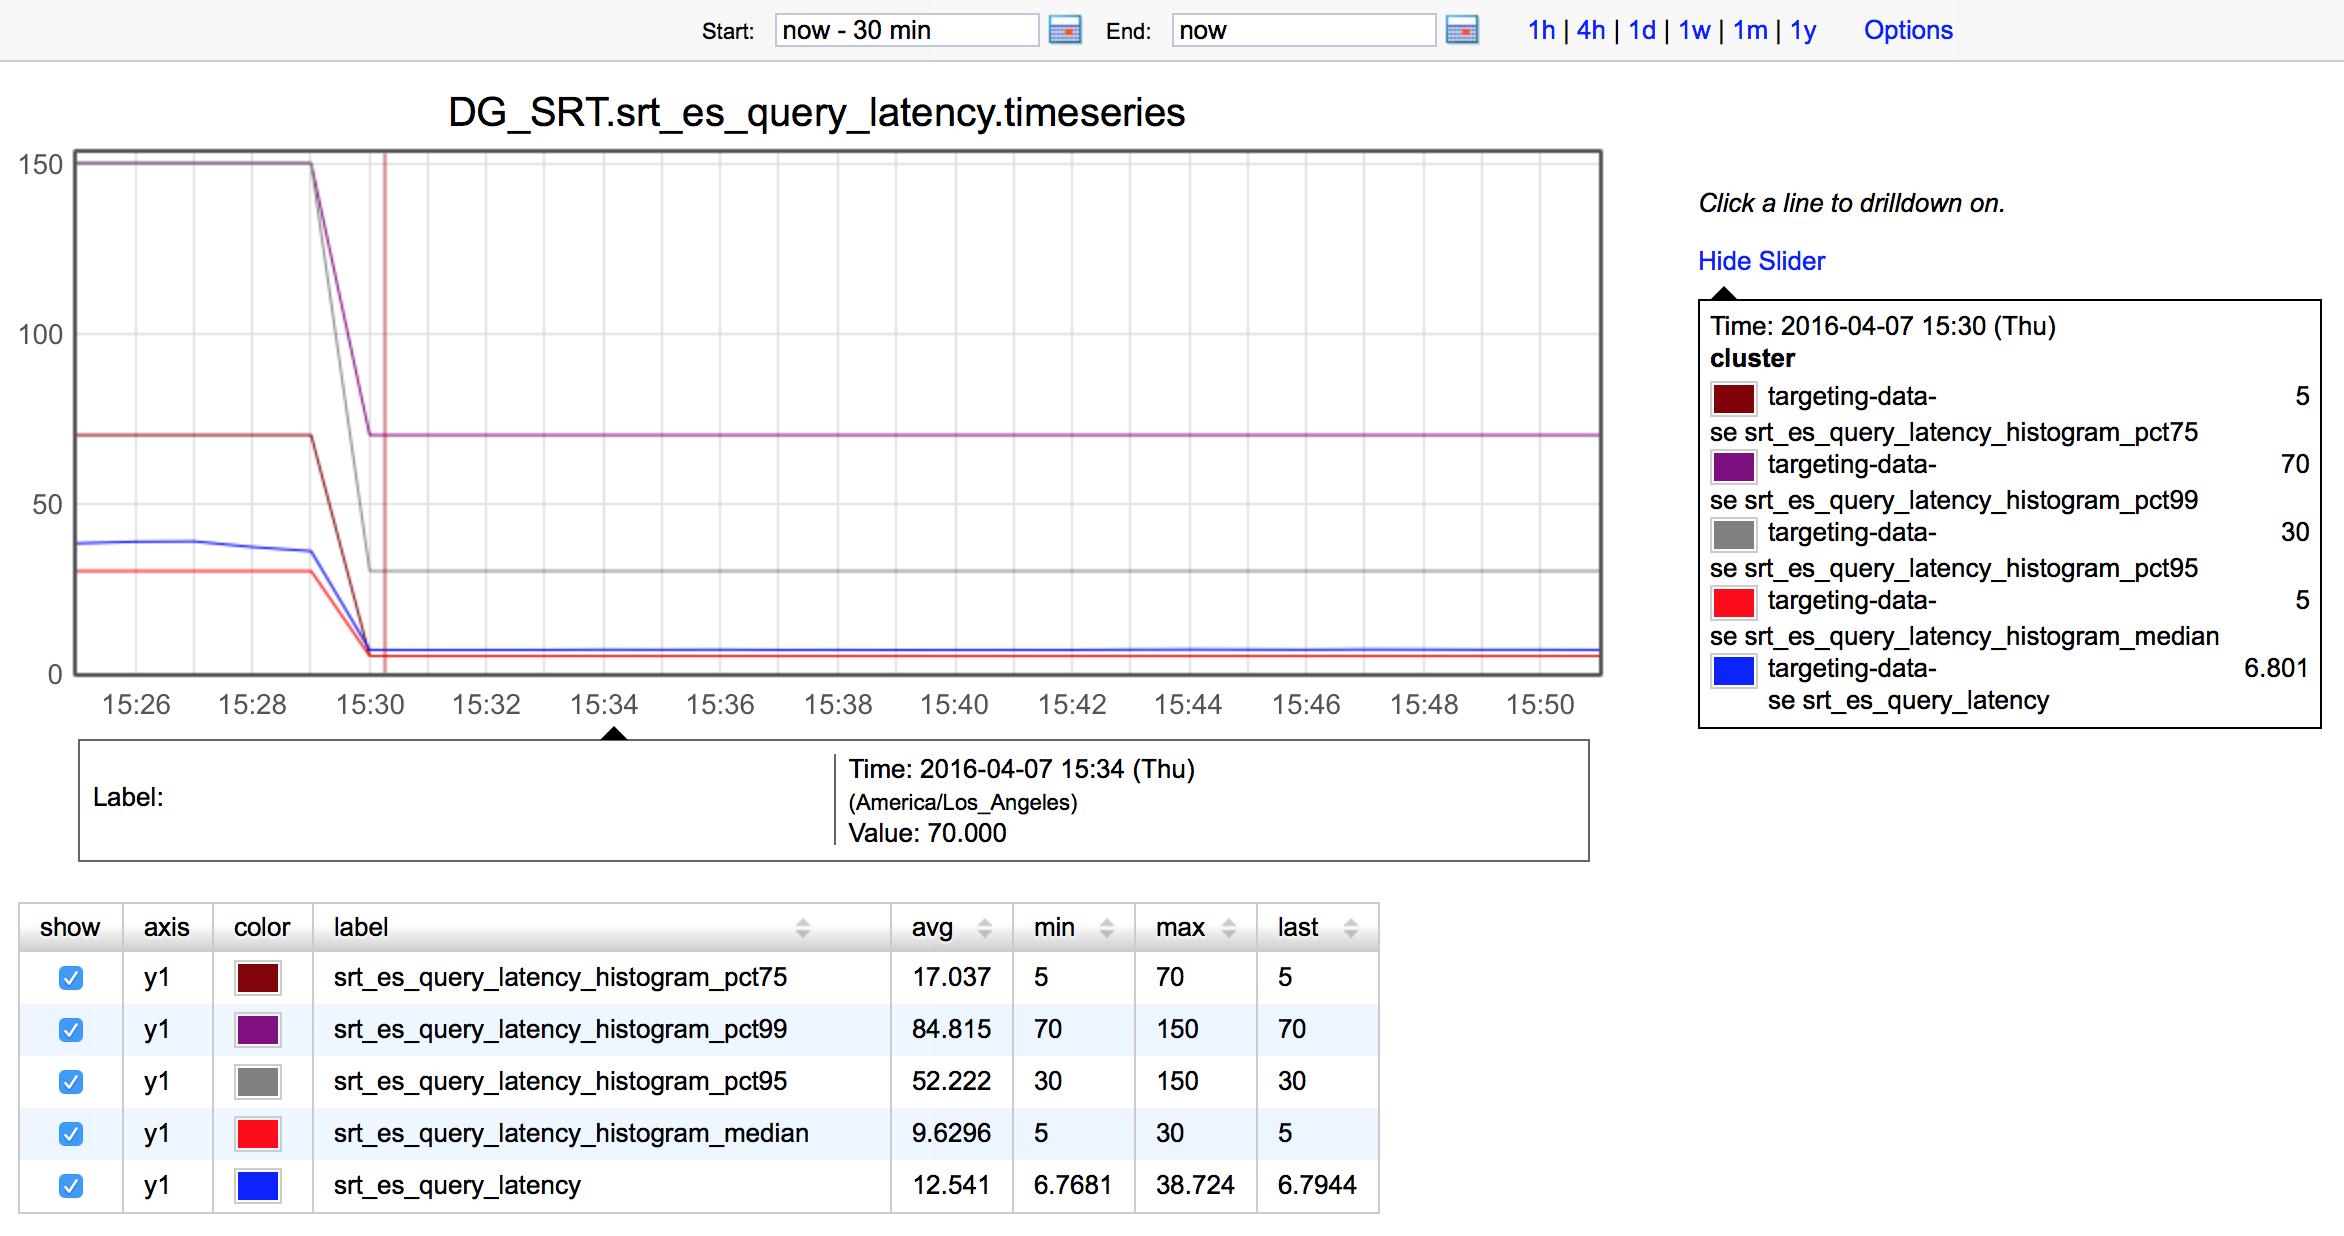 Average Search Latency